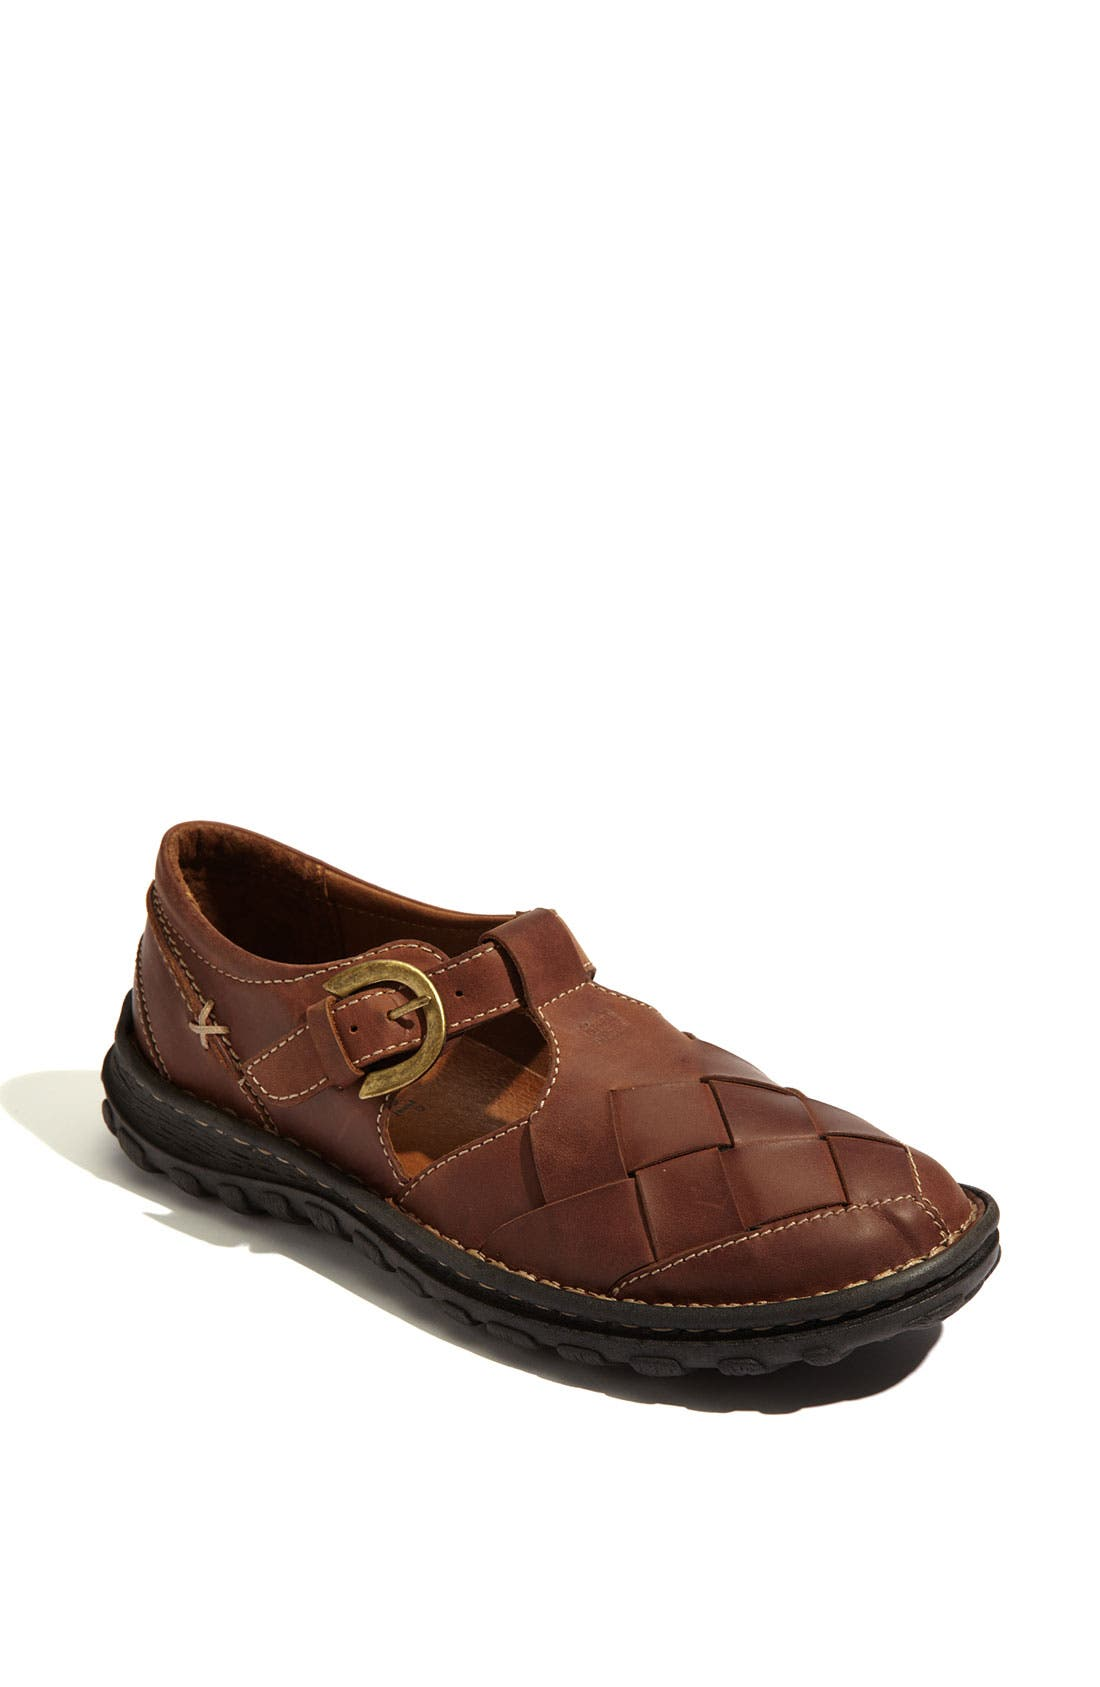 Alternate Image 1 Selected - Josef Seibel 'Frita' Sandal (Online Only)